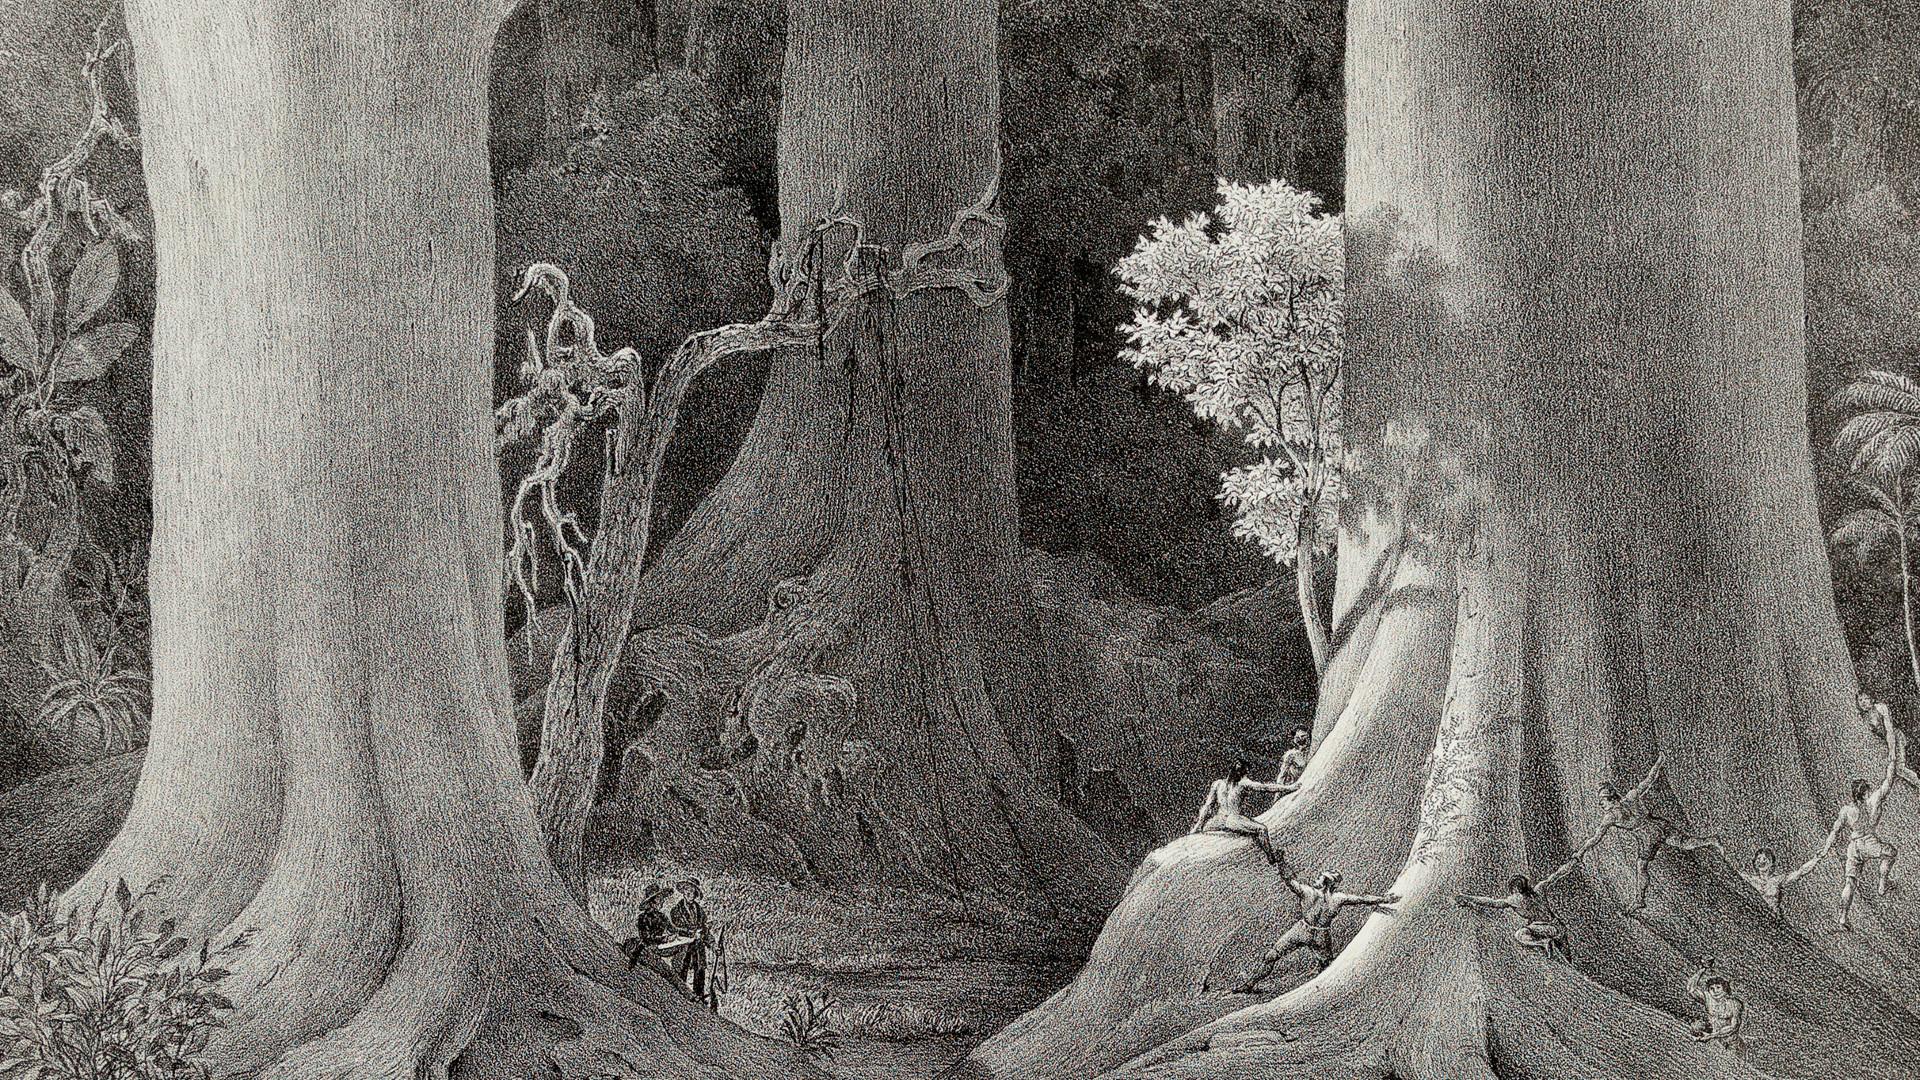 exploração floresta socioambiental